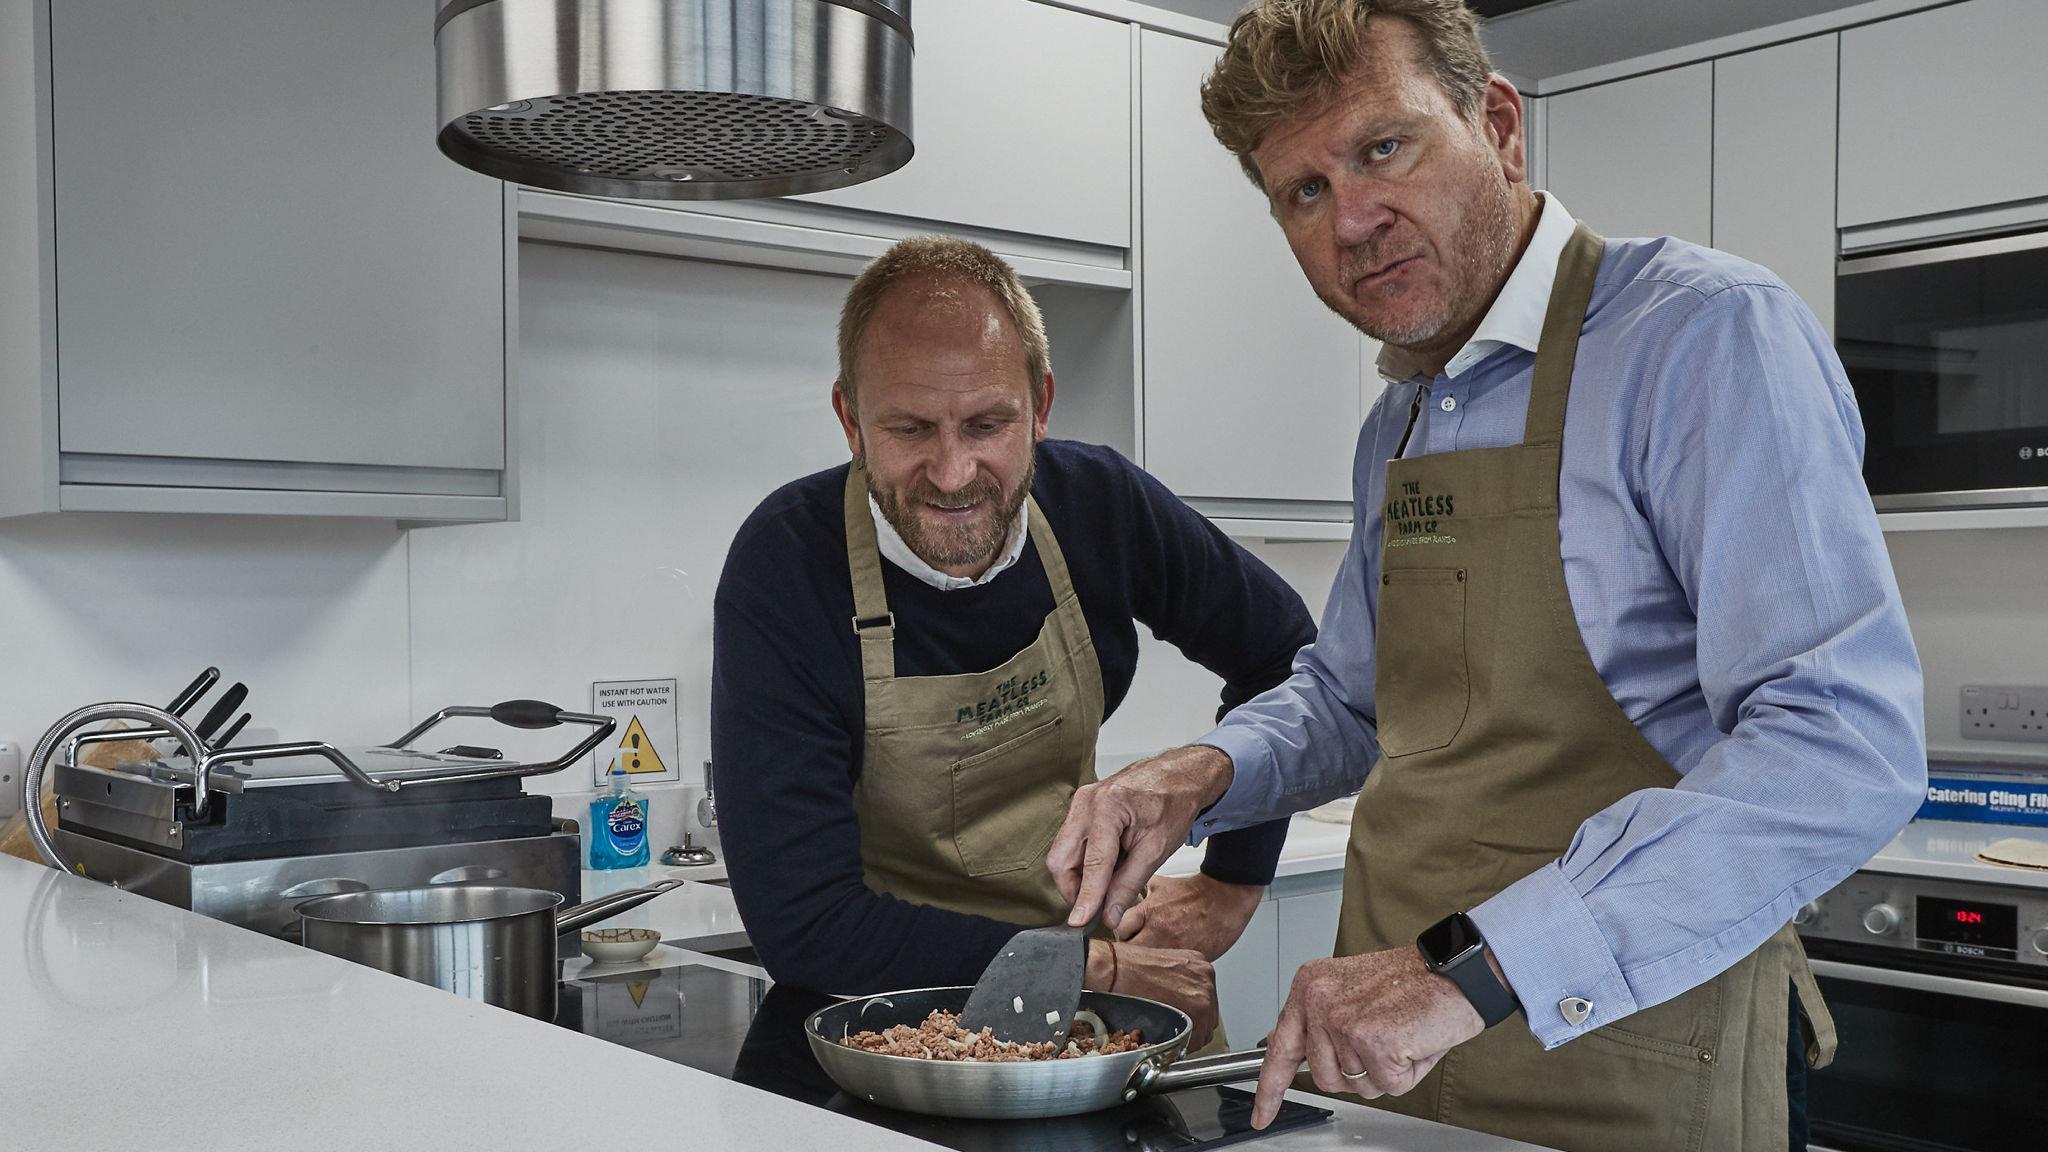 Meatless Farm looks to stir up US vegetarian market | Financial Times